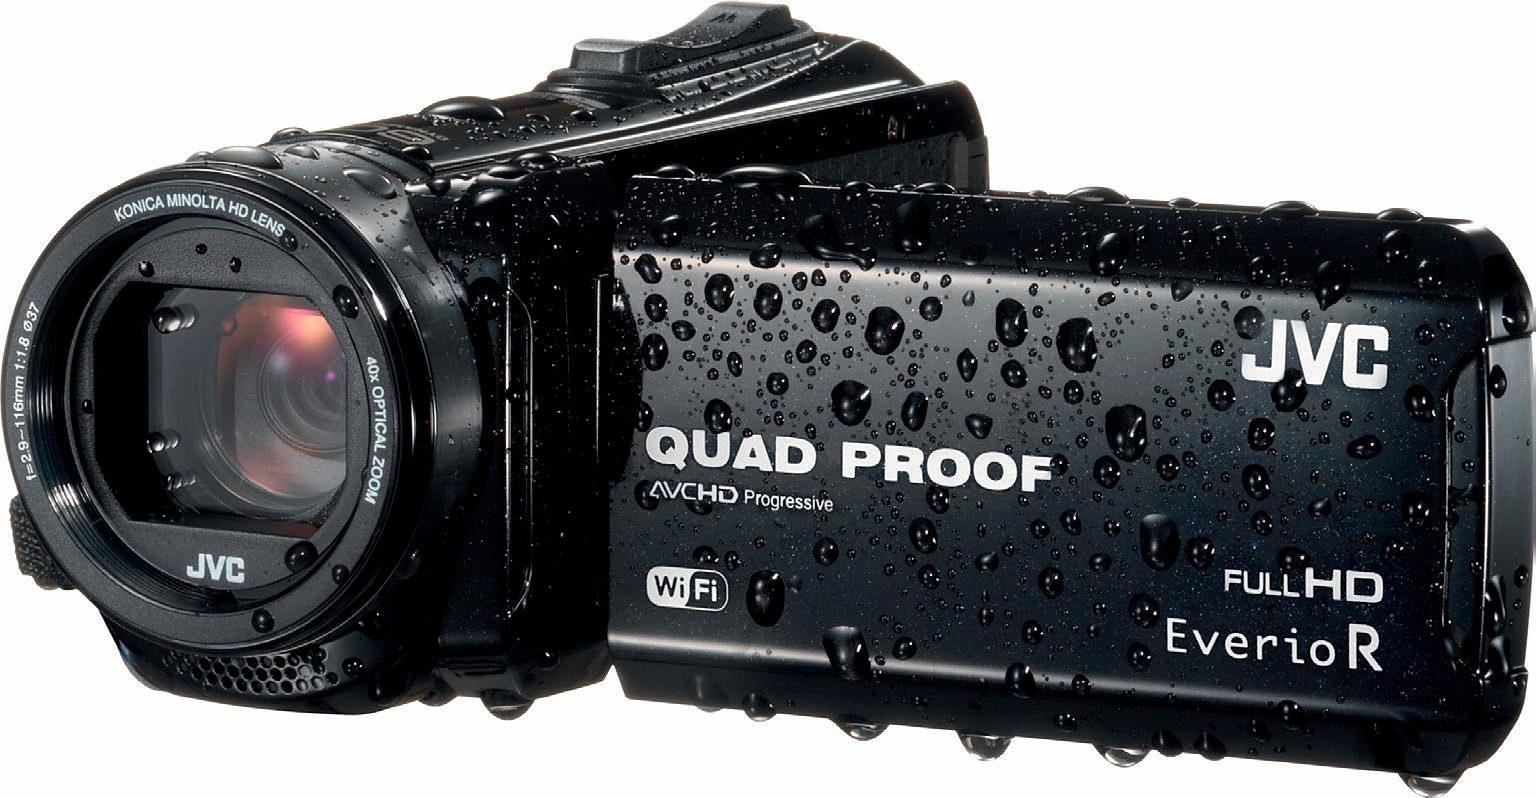 JVC GZ-RX610 1080p (Full HD) Camcorder, WLAN, Staubfest